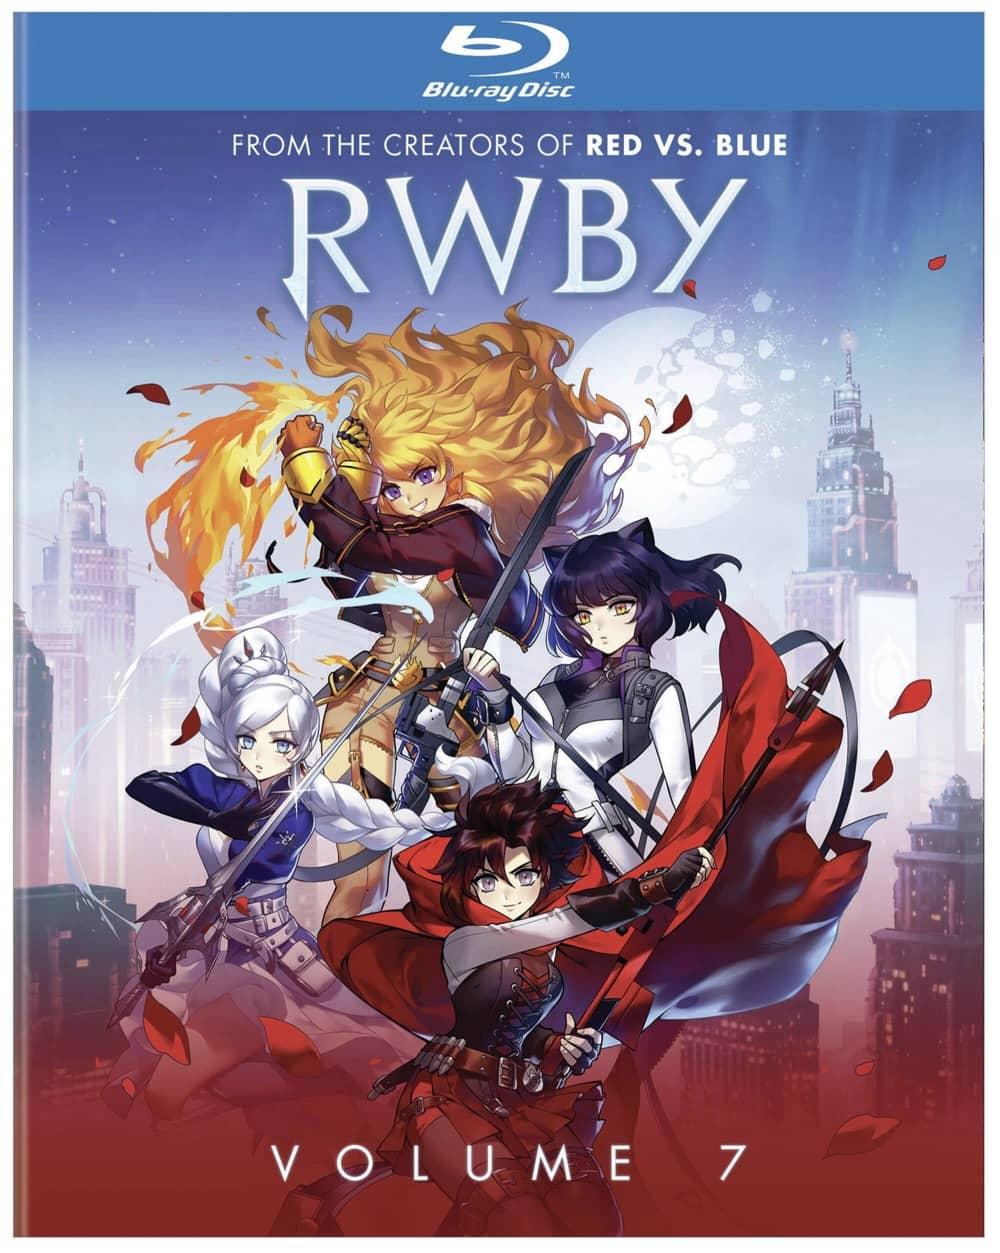 RWBY Volume 7 Bluray